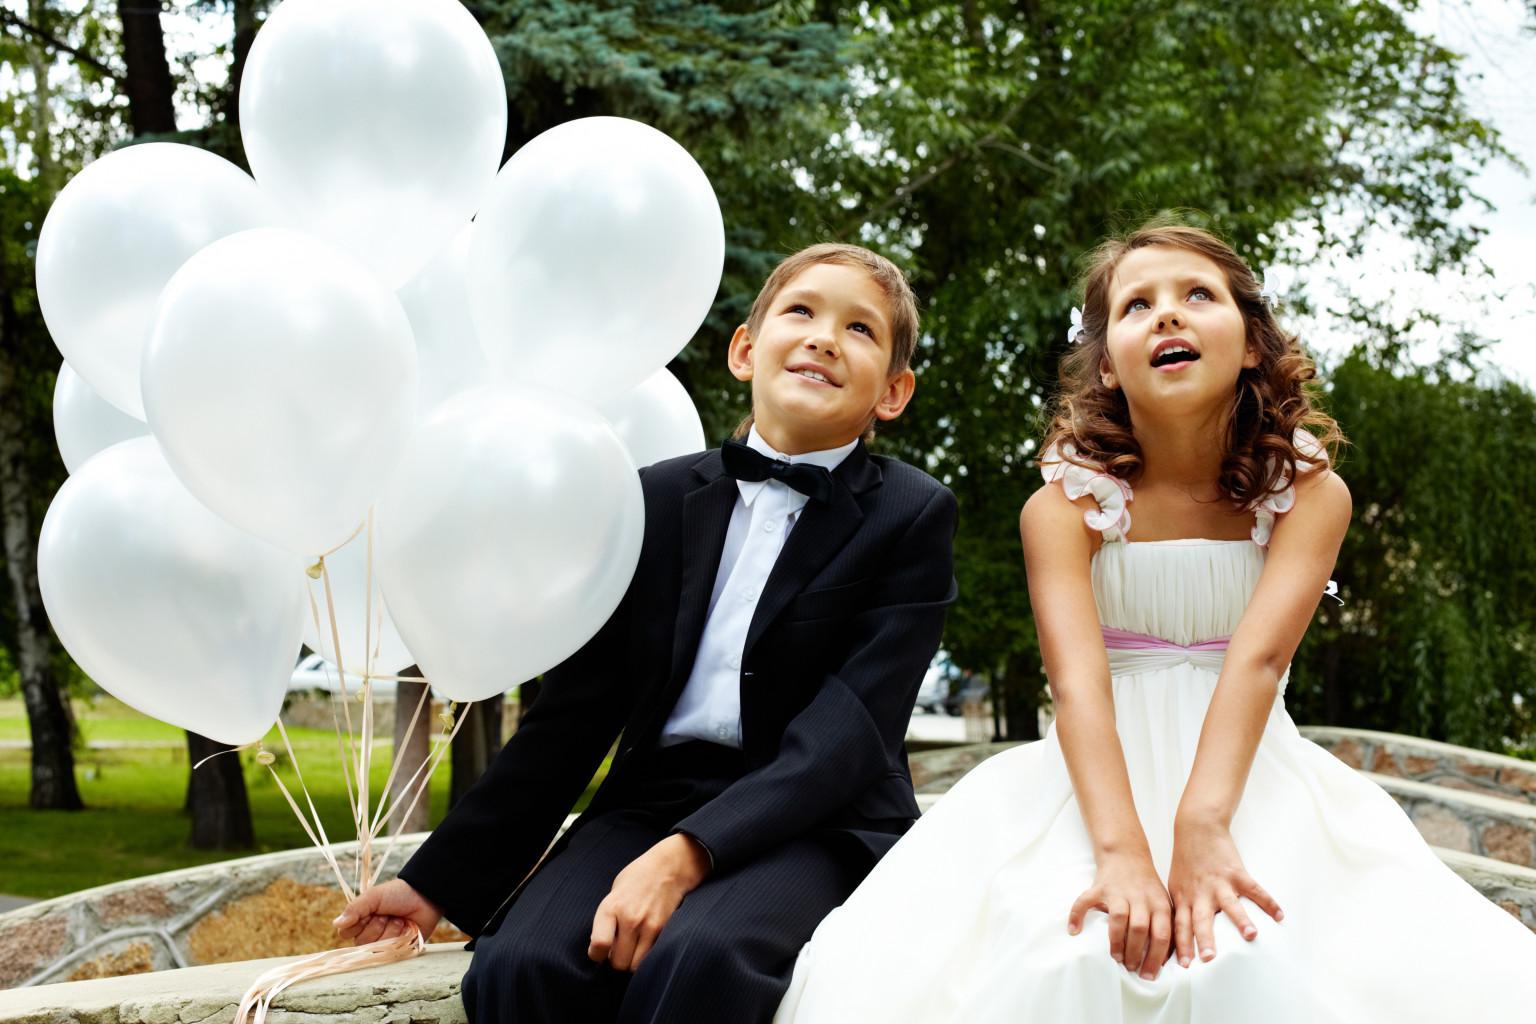 Kids Jewelry Design Ideas for Weddings